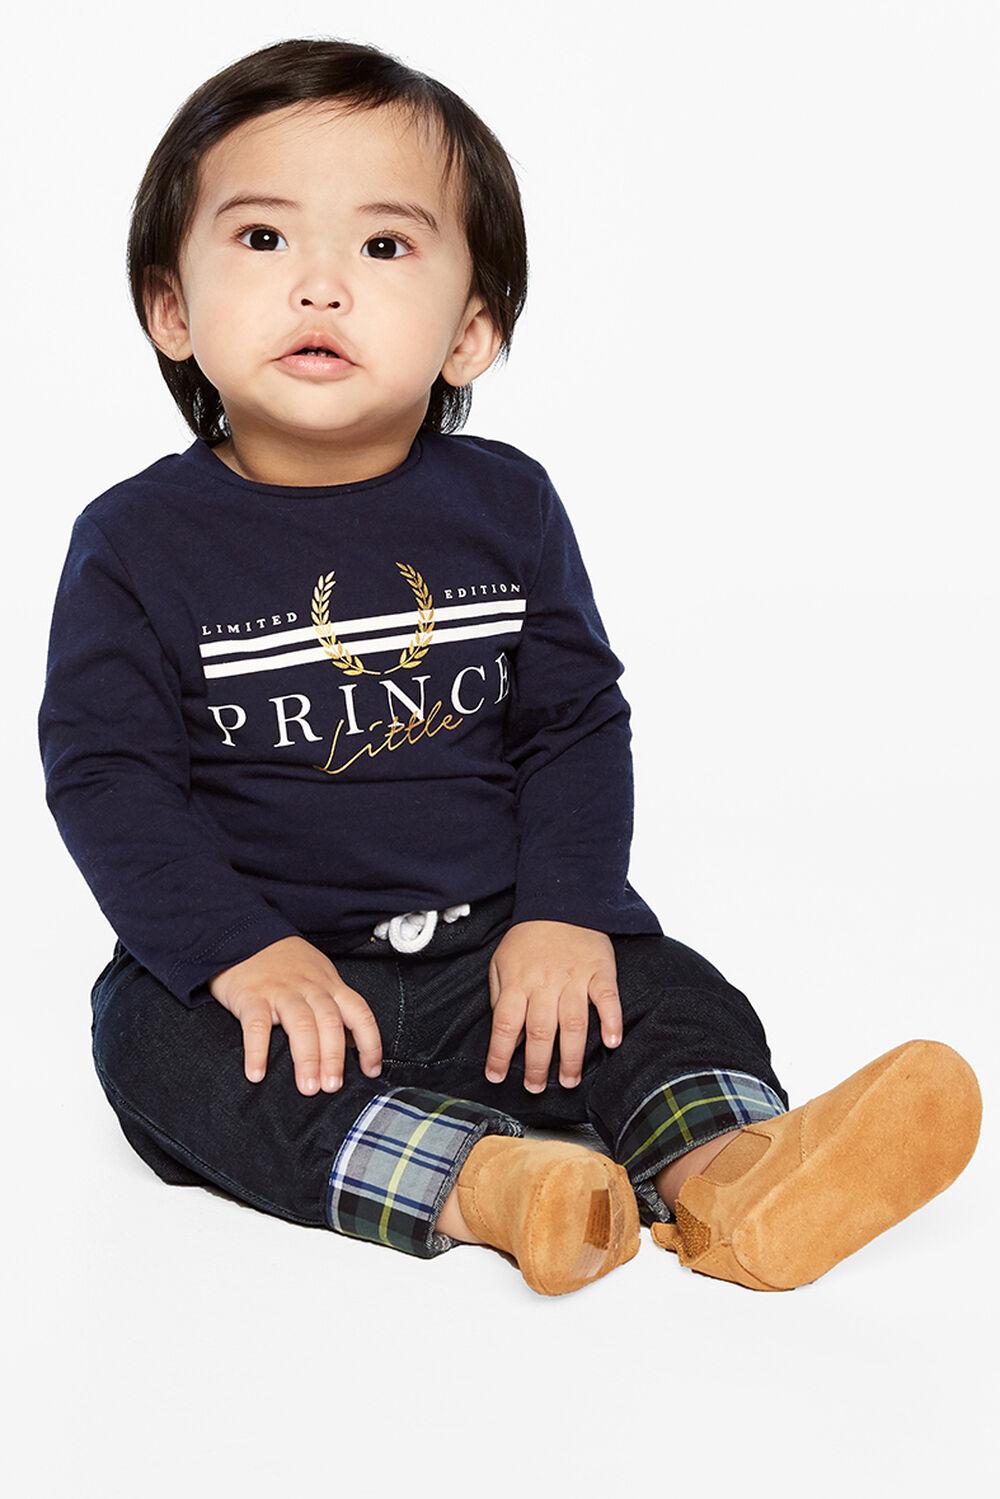 PRINCE LONG SLEEVE TOP in colour BLACK IRIS